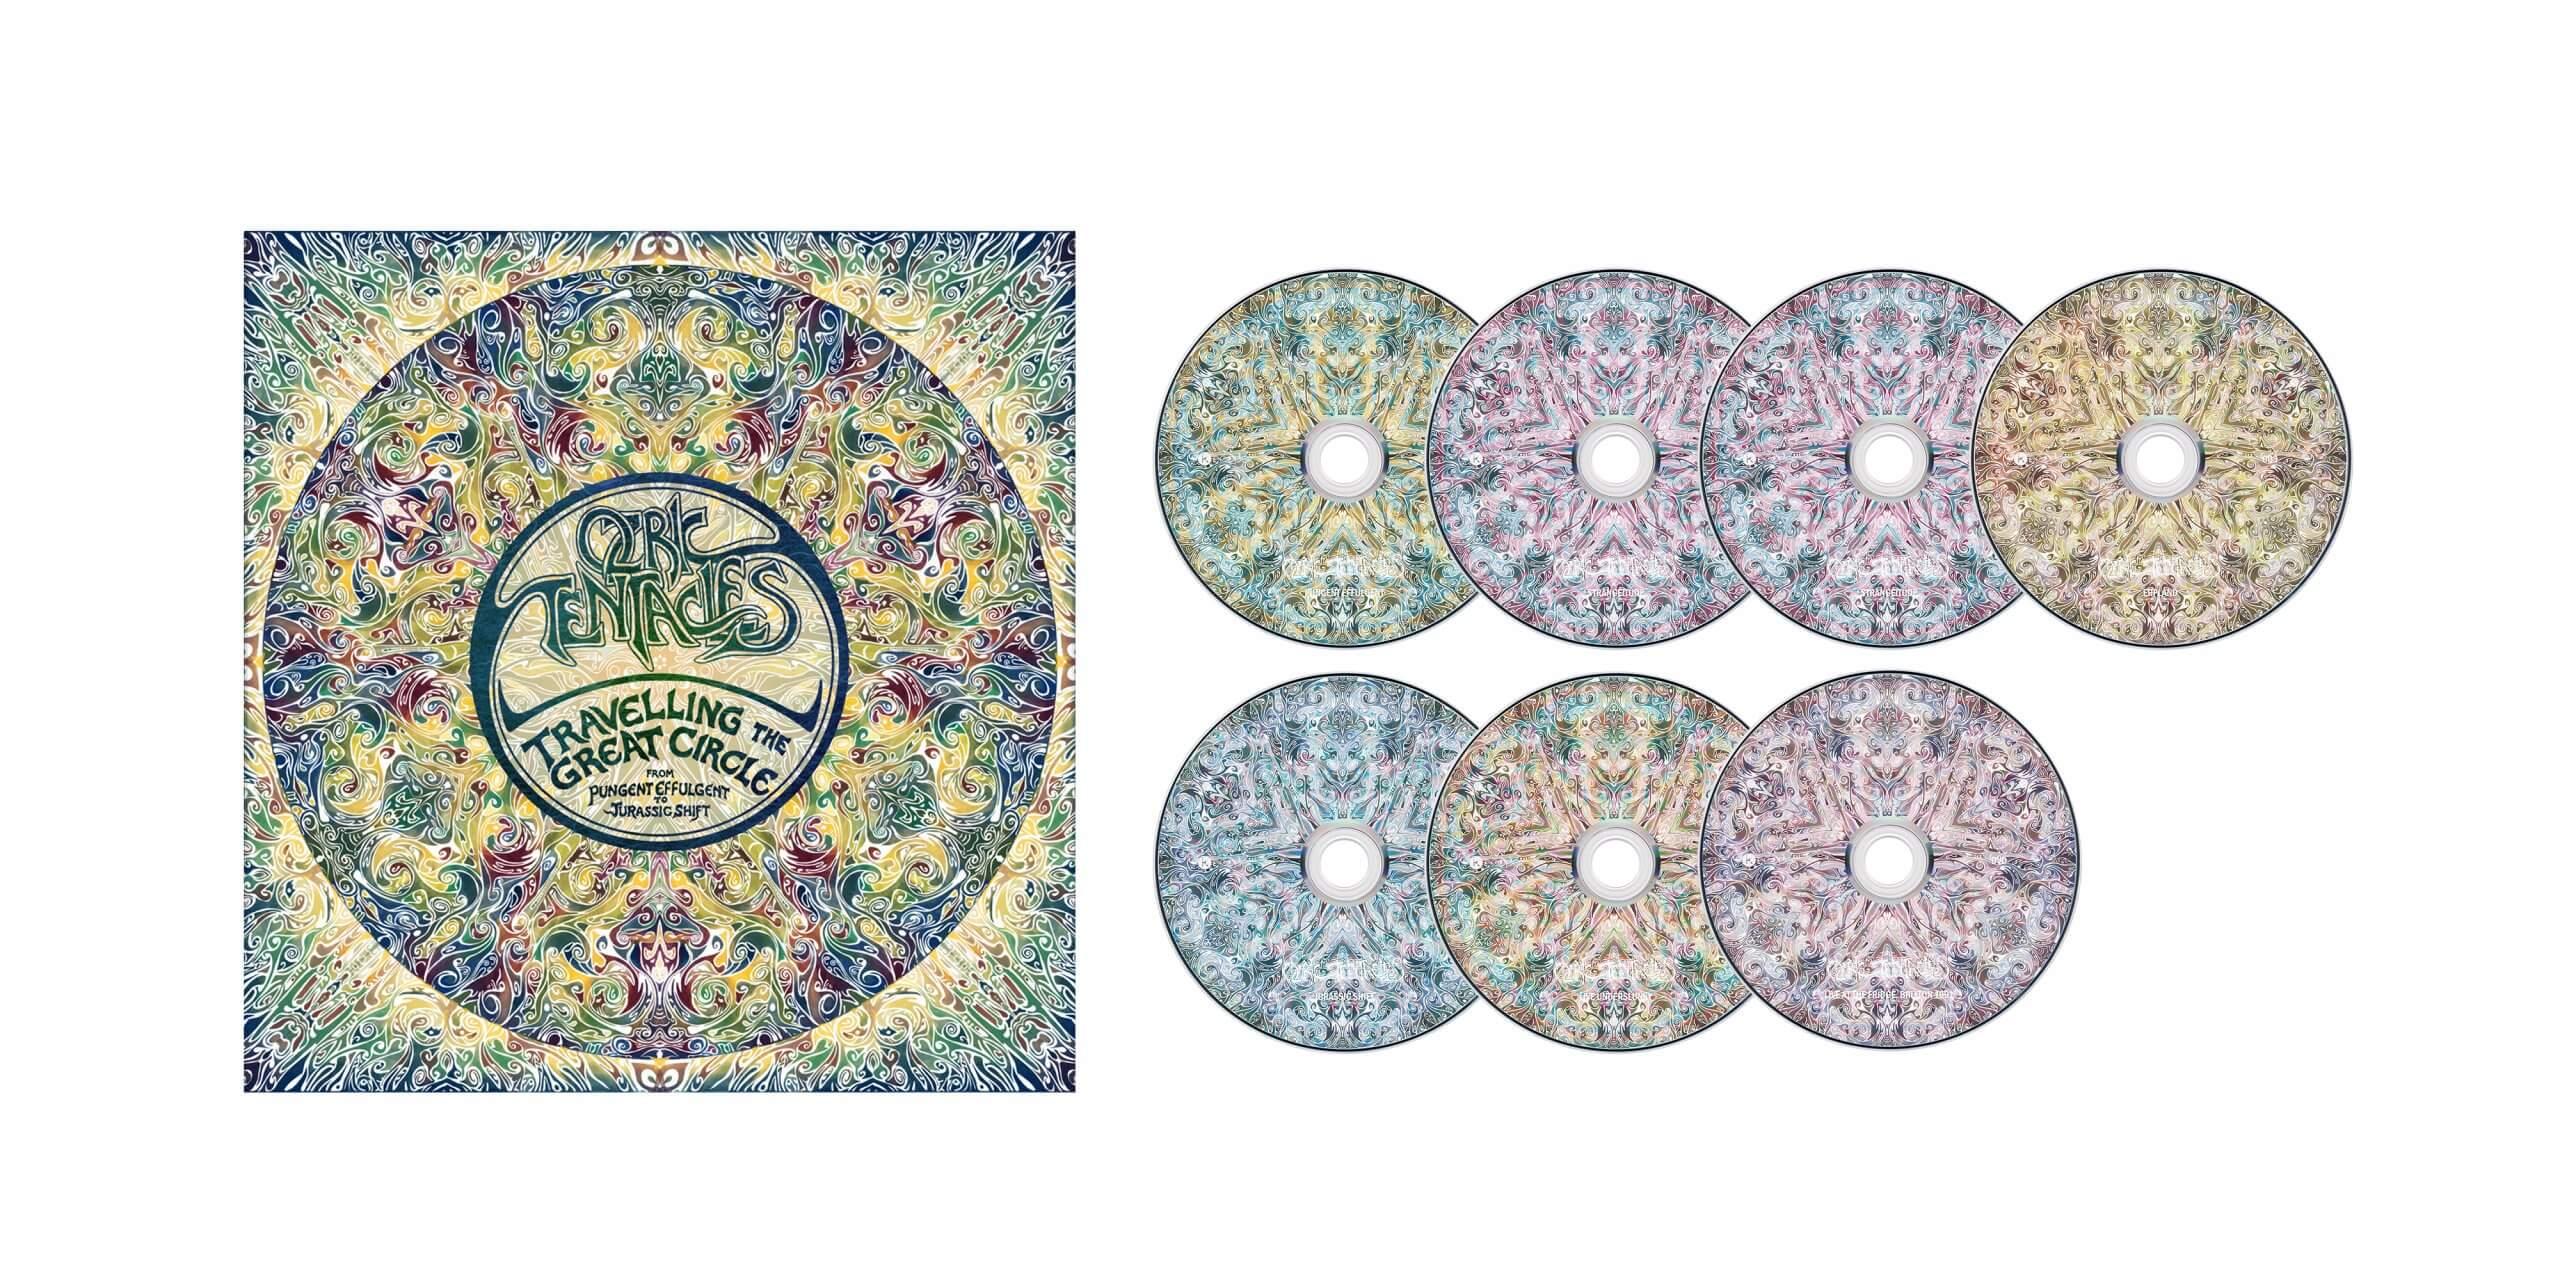 Album artwork with CDs